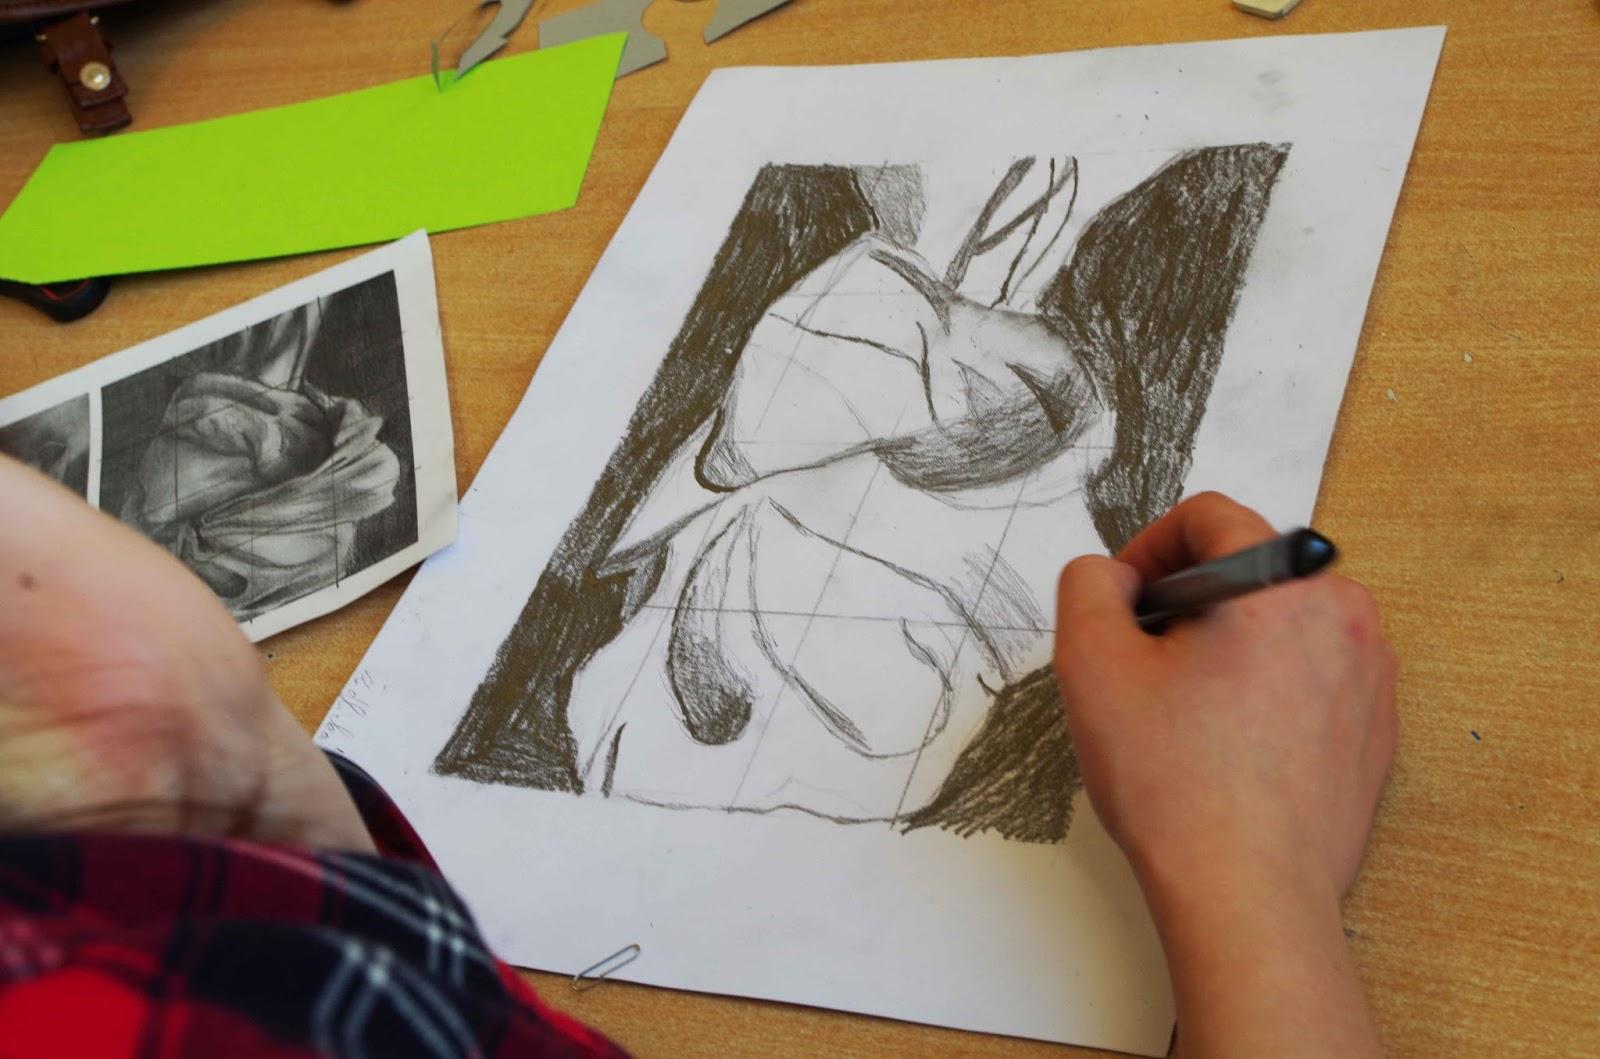 Vytvarka Svinov Po2 Individualni Program Postavy Studijni Malba